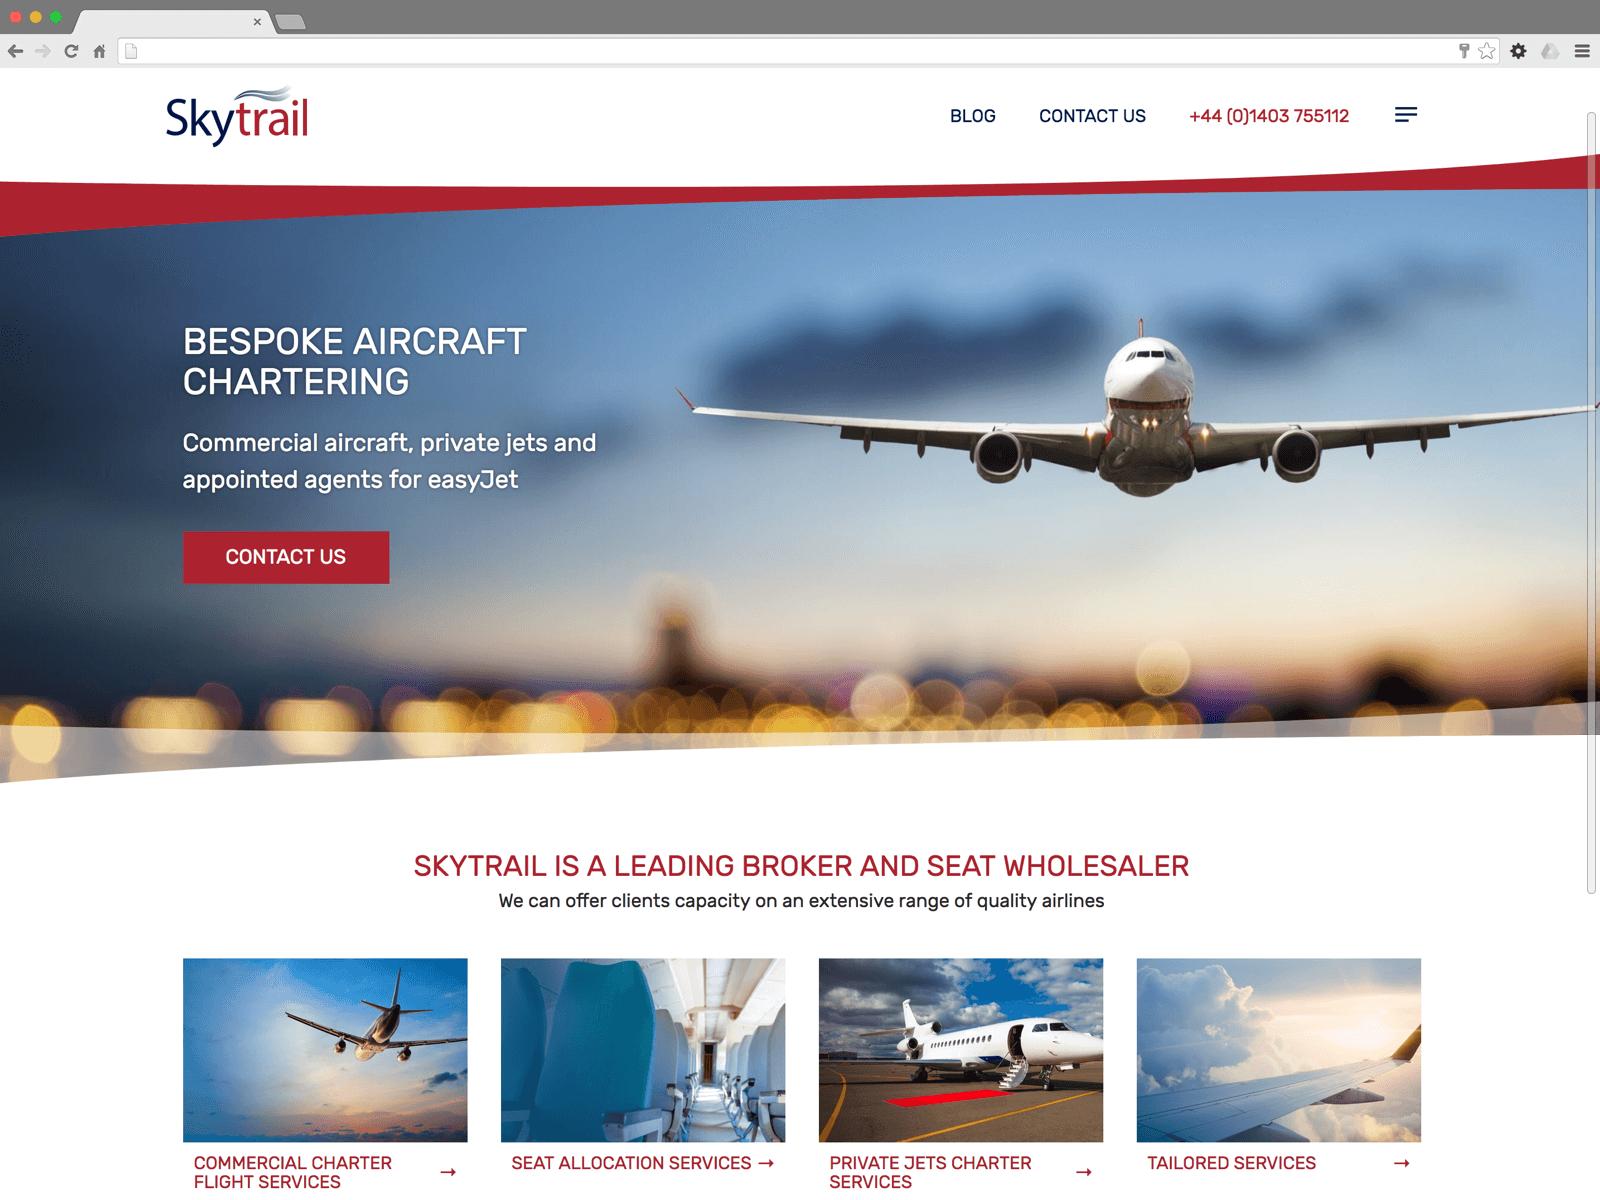 Skytrail website (Website on desktop)